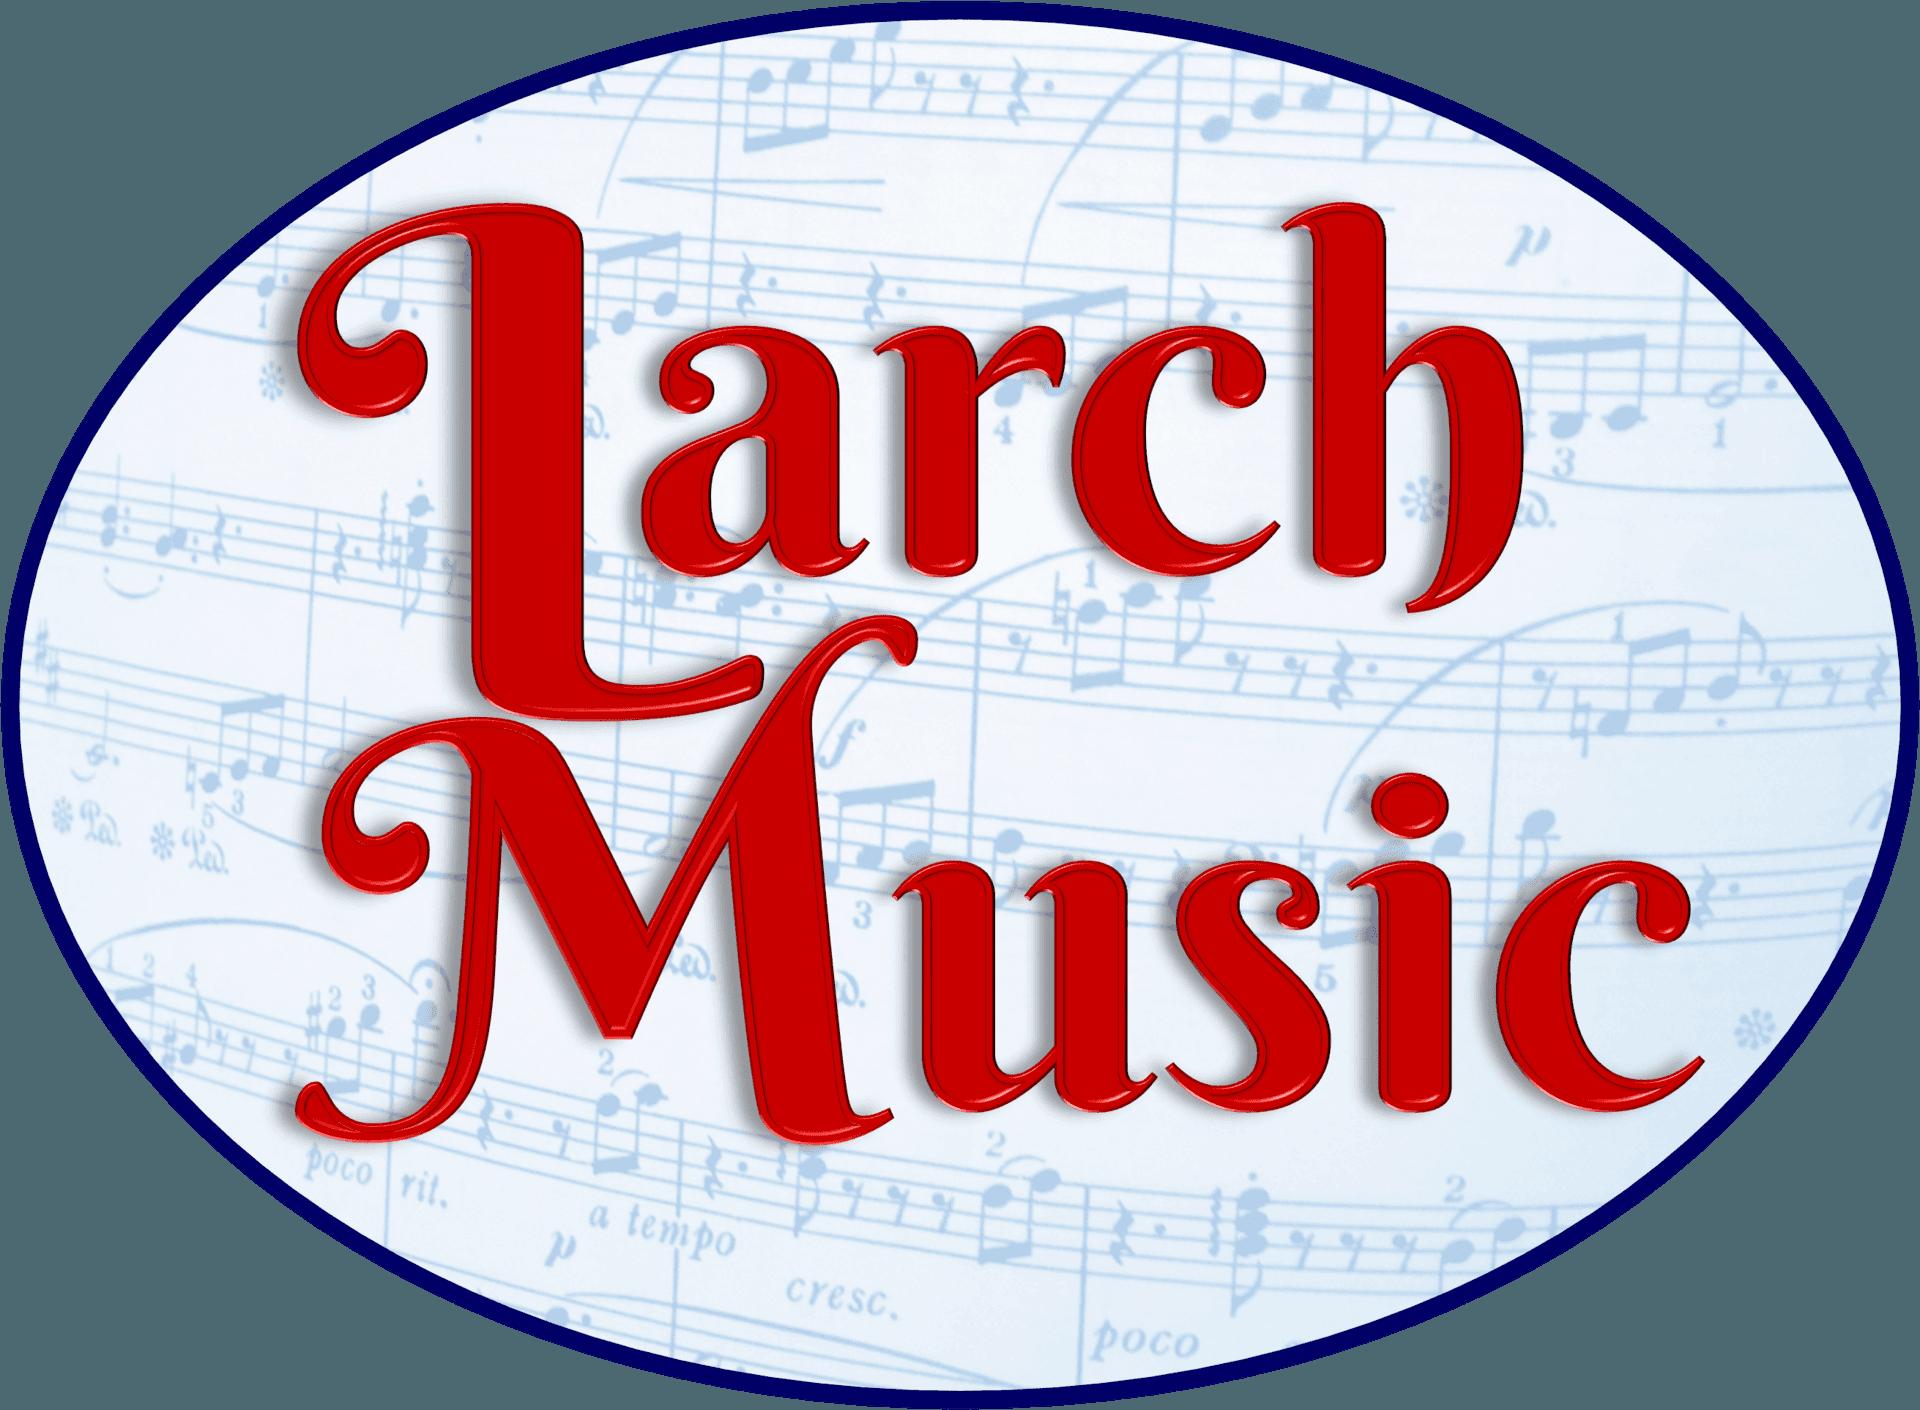 Larch brass band sheet. Xylophone clipart music equipment